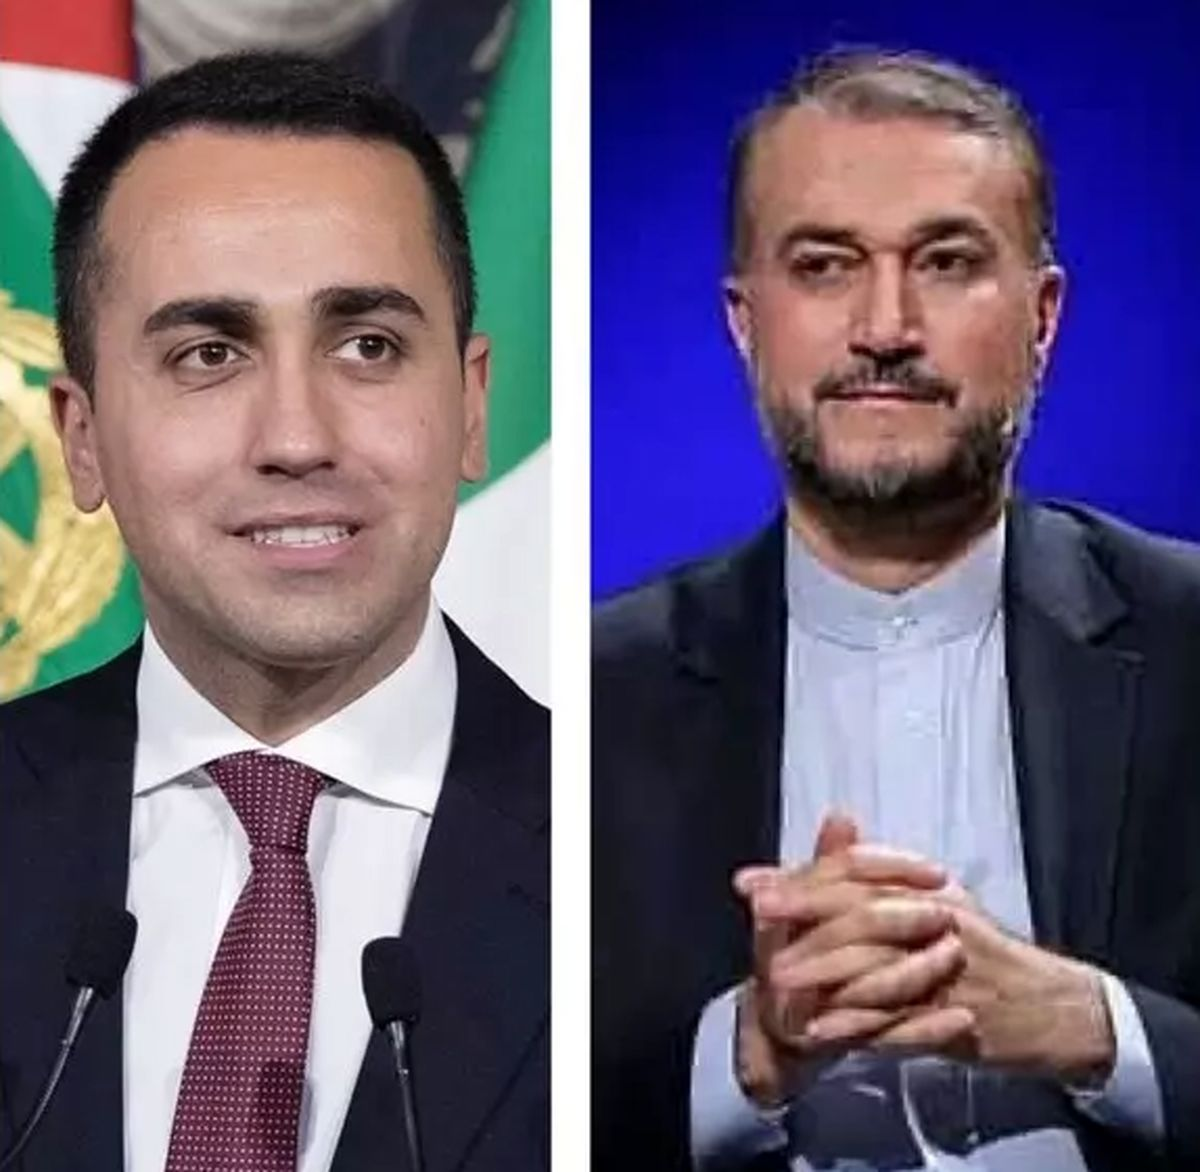 پیام تبریک وزیر خارجه ایتالیا به امیرعبداللهیان